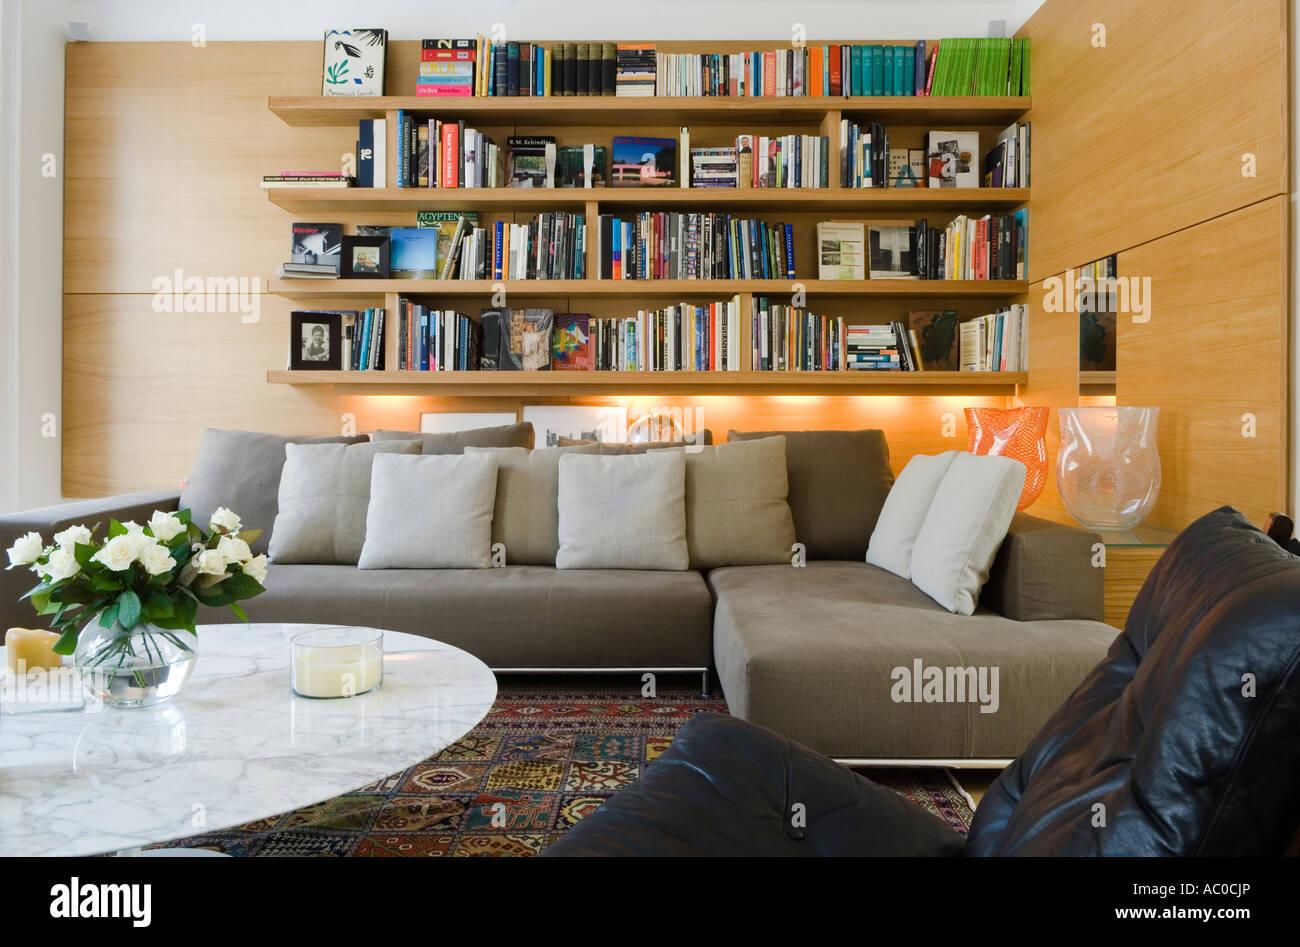 Modern Sitting Room With Bookshelf 2 Piece Sofa And Coffee Table